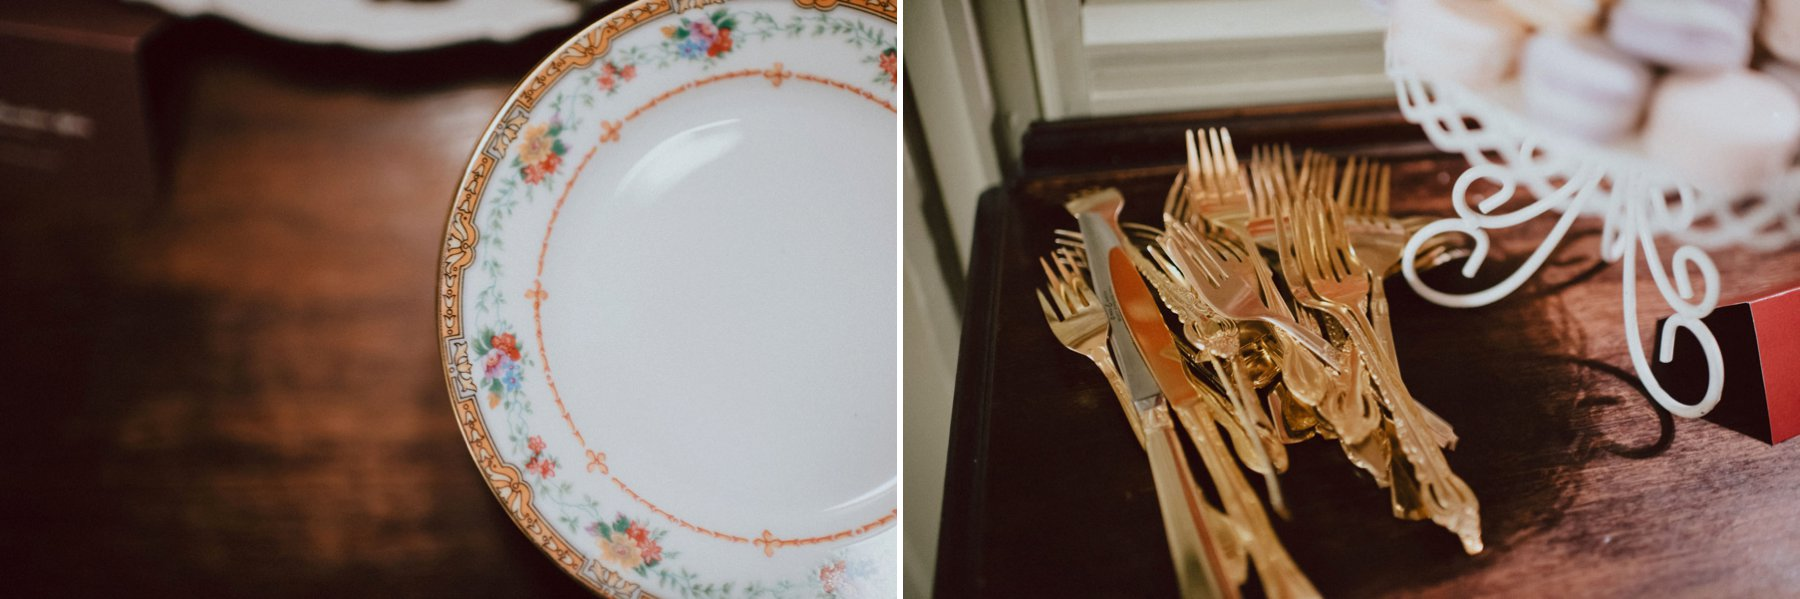 faunbrook-bed-and-breakfast-wedding-166.jpg